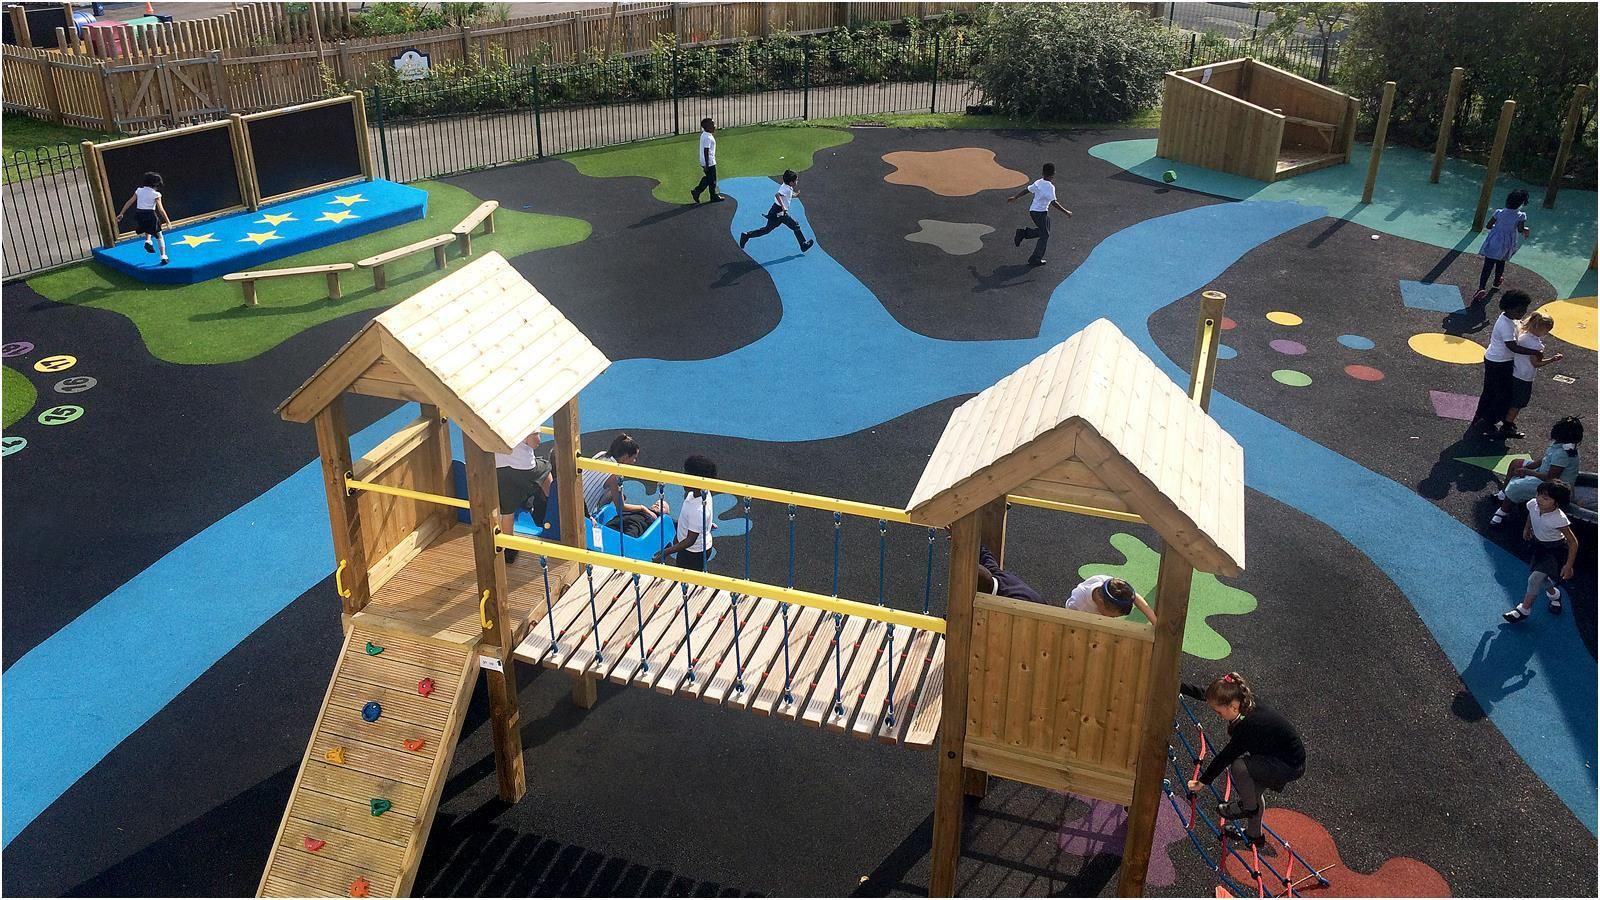 Pin by yvonne heywood on playground | Pinterest | Playground